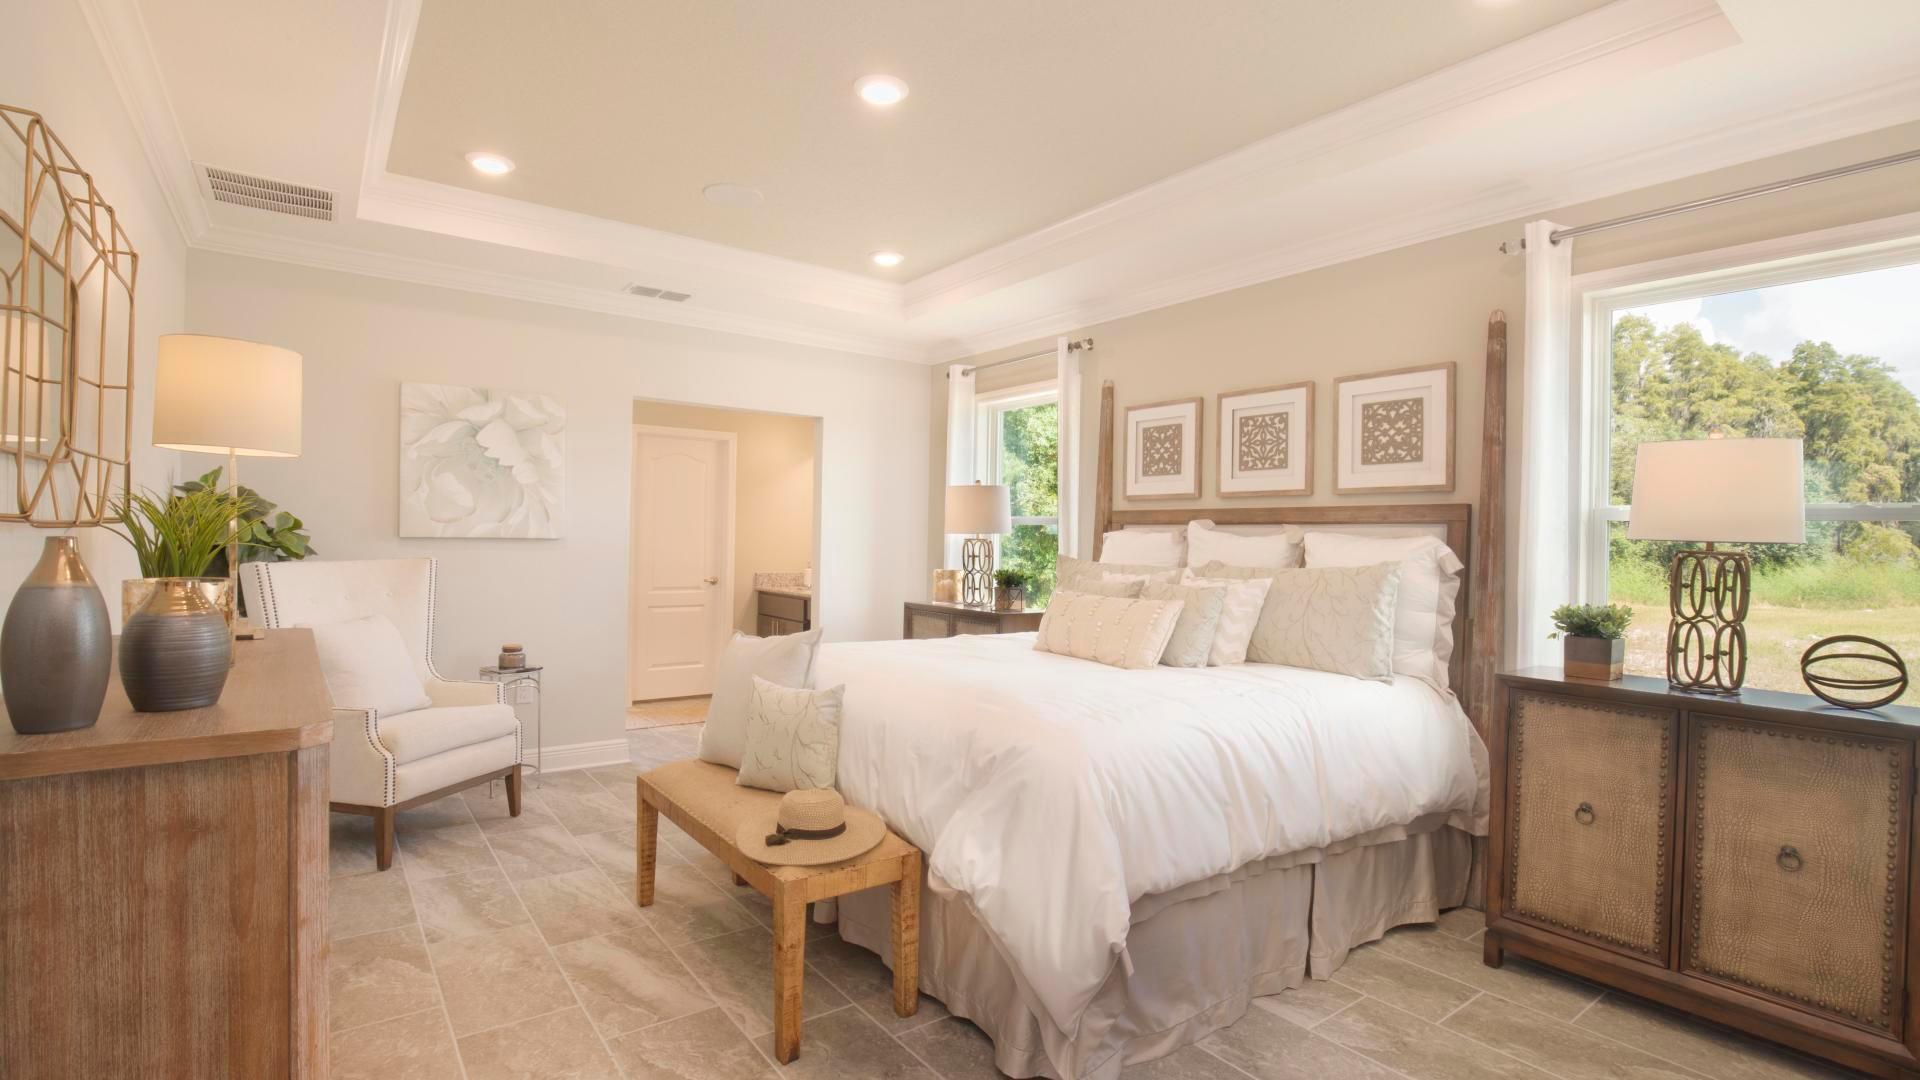 Bedroom featured in the Huntington By Maronda Homes in Daytona Beach, FL